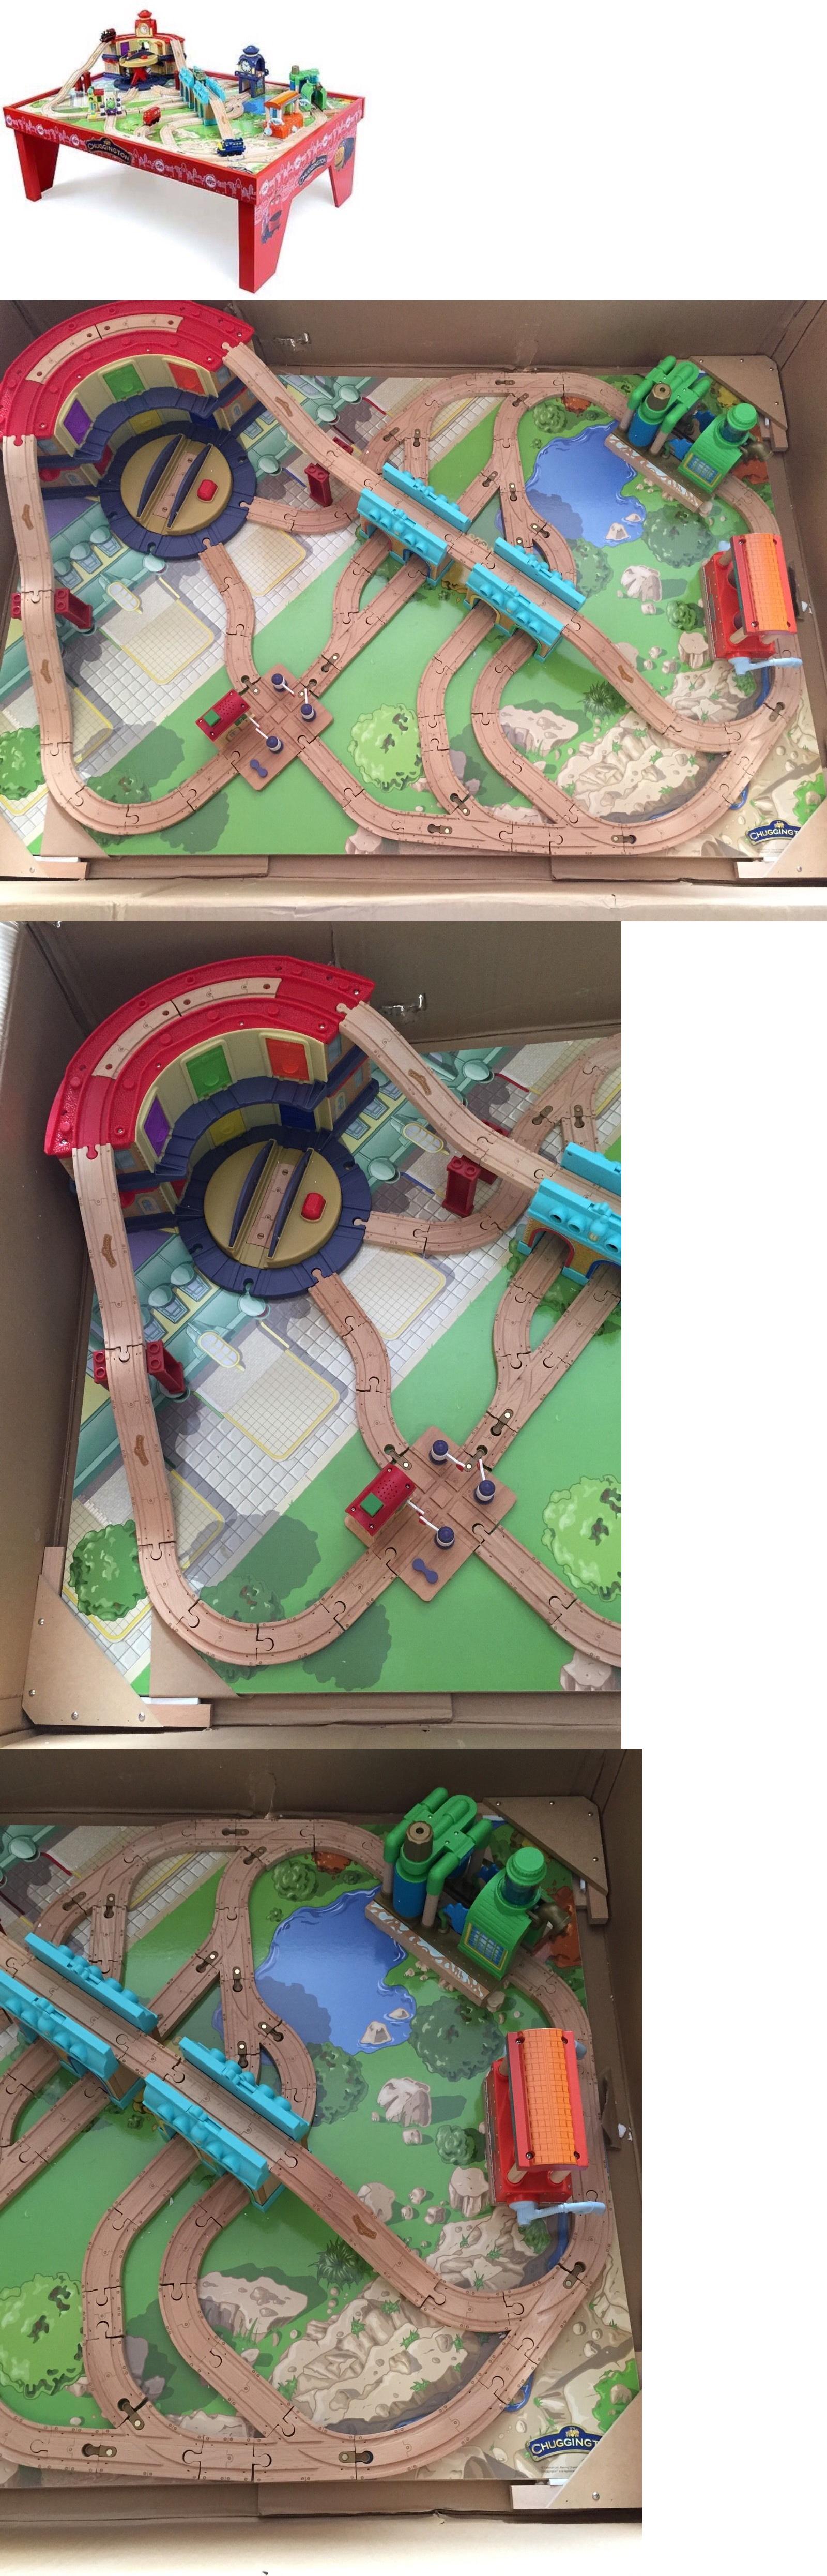 Train Sets 113519: Chuggington Big Train Table Play Set -> BUY IT ...